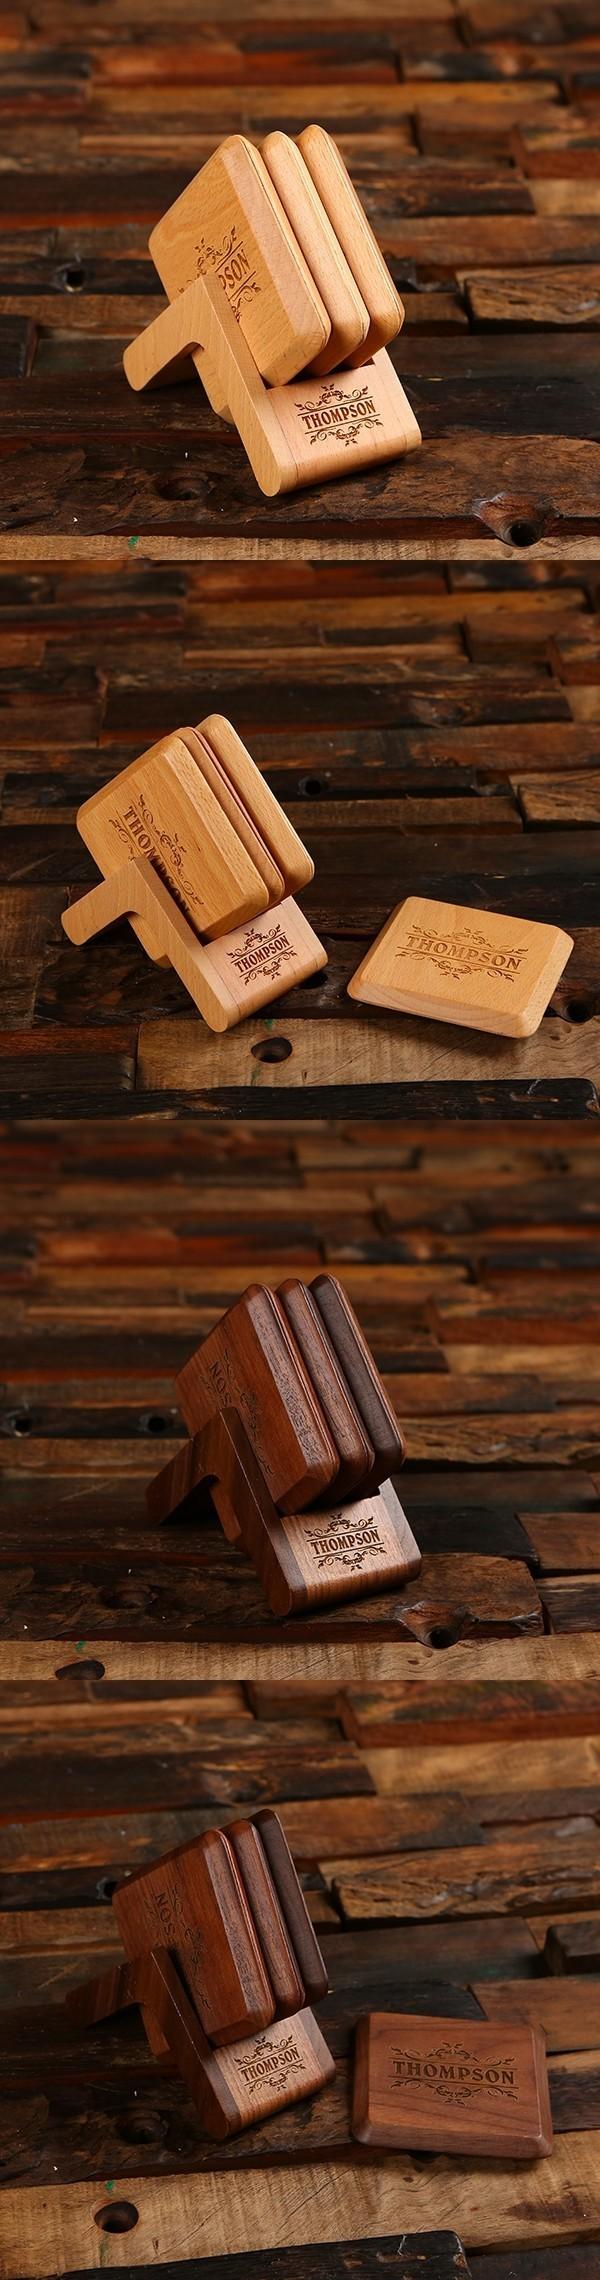 Personalized Black-Walnut Wood Coasters and Storage Box (Set of 4)